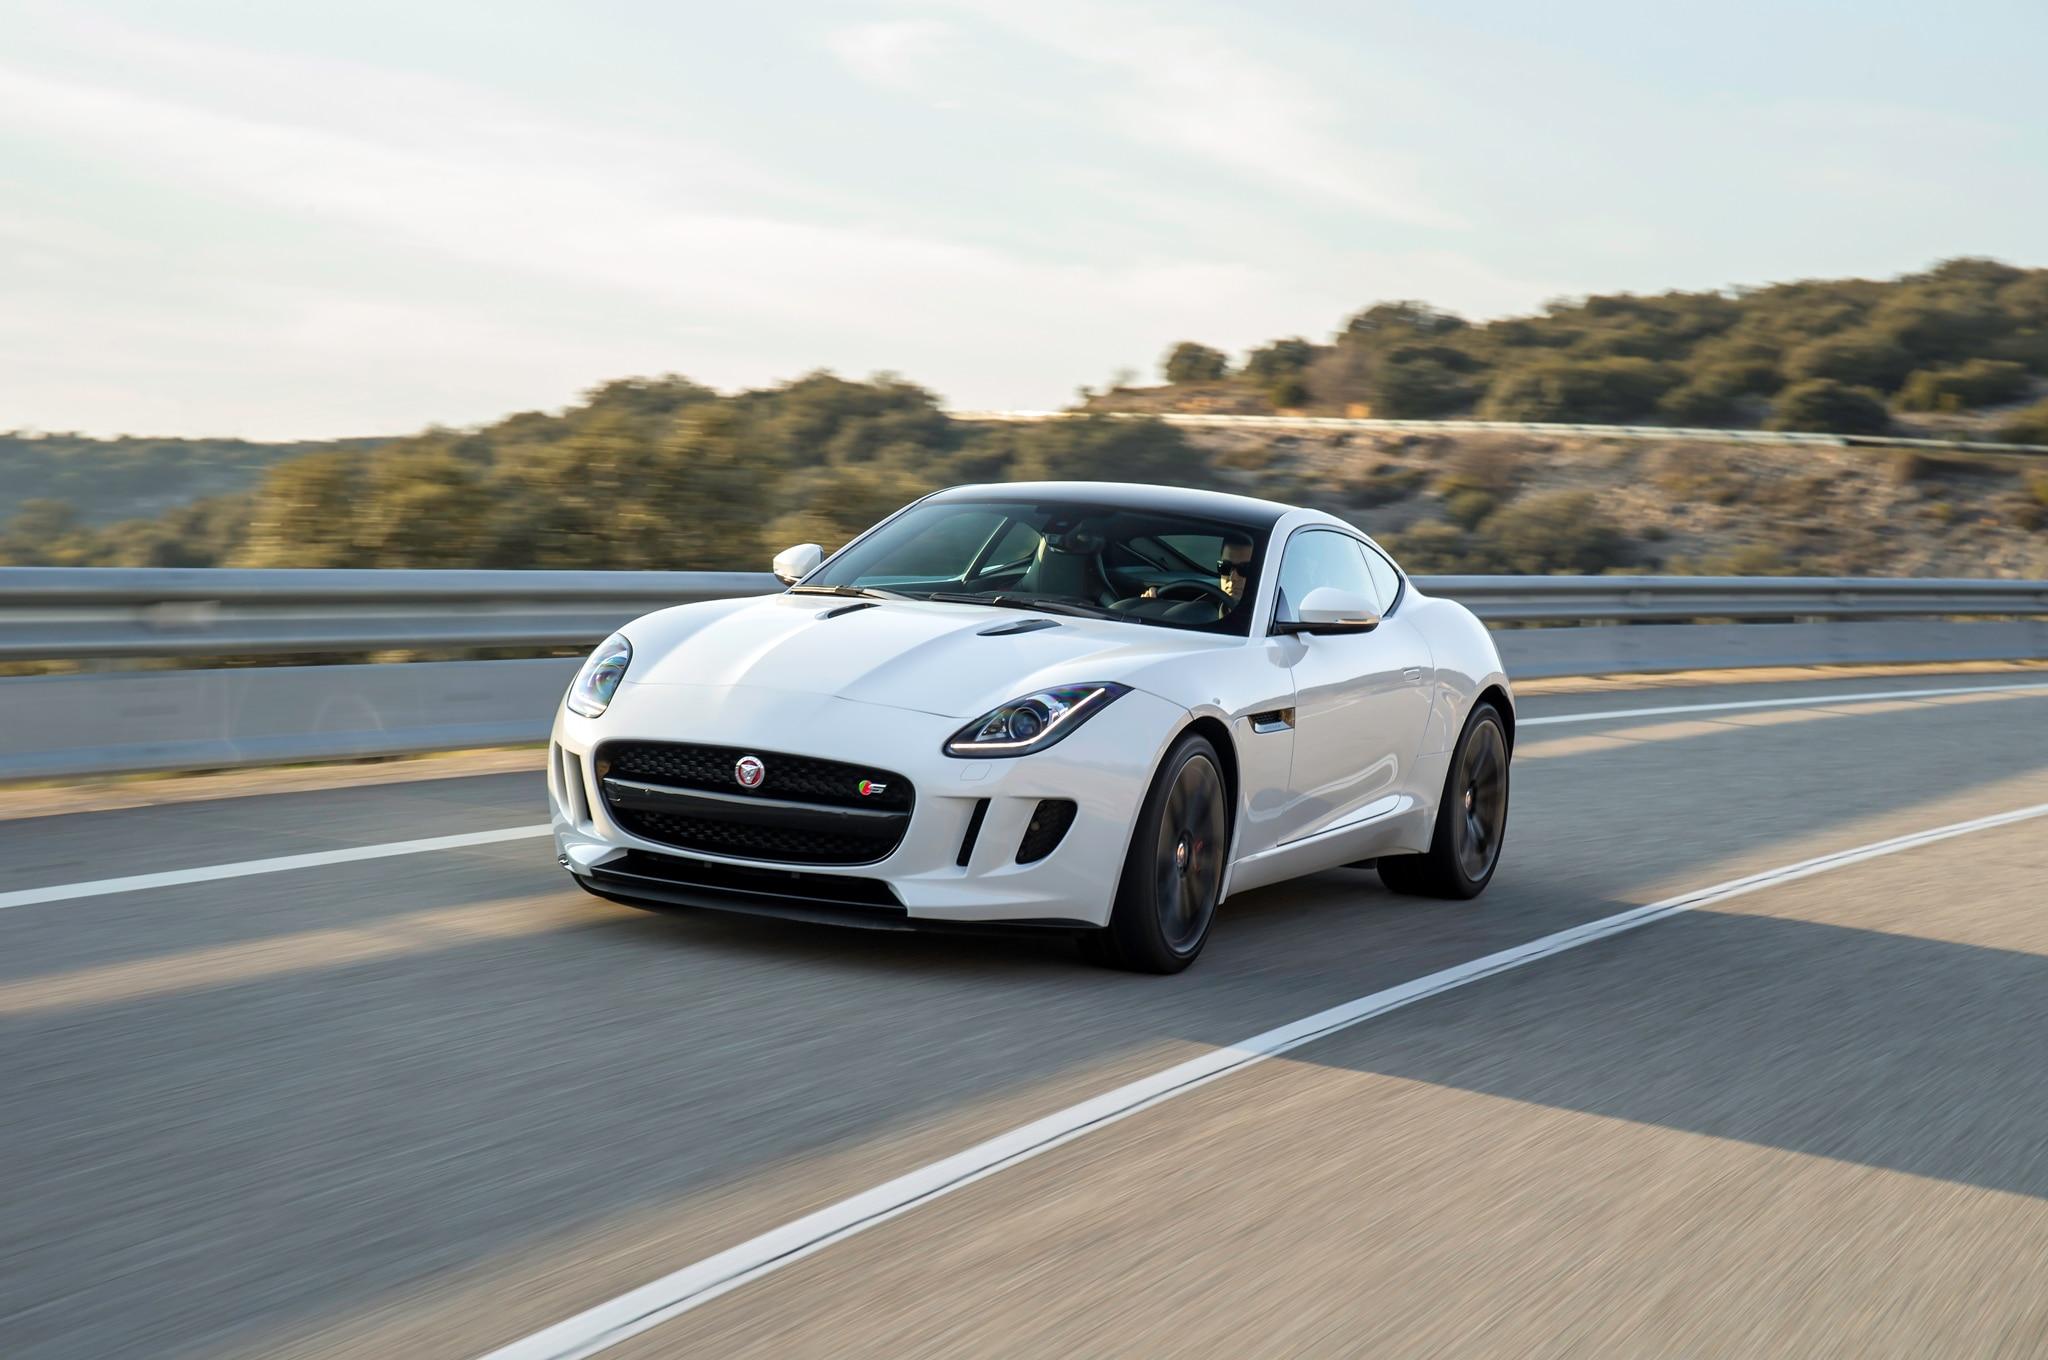 2015 Jaguar F Type S Front End In Motion